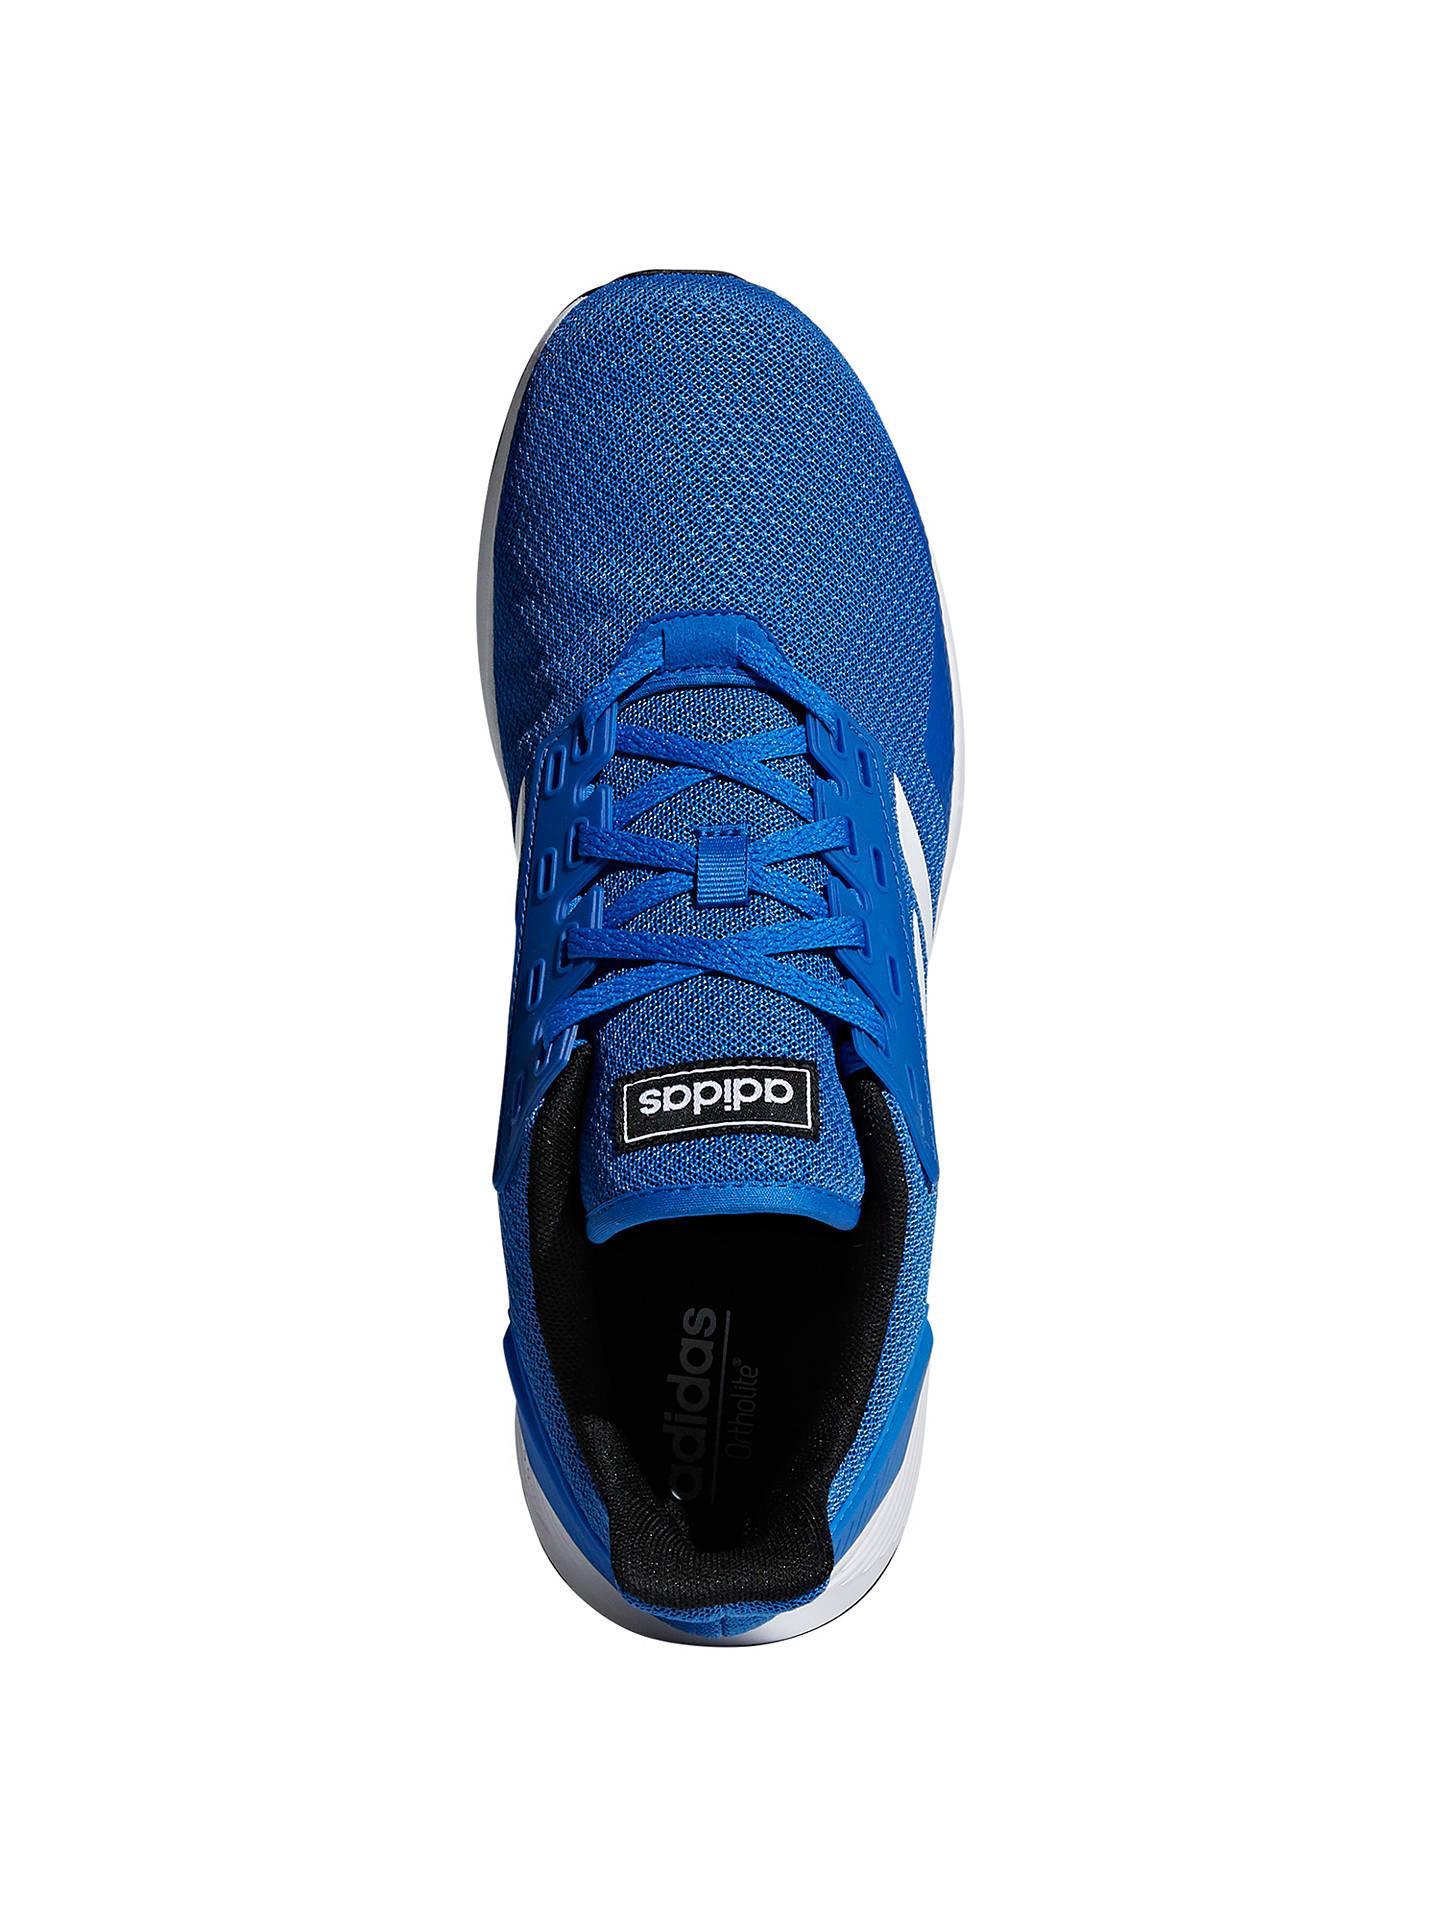 free shipping 8faf9 514a7 ... Buy adidas Duramo 9 Men s Running Shoes, Blue White, 8 Online at  johnlewis ...